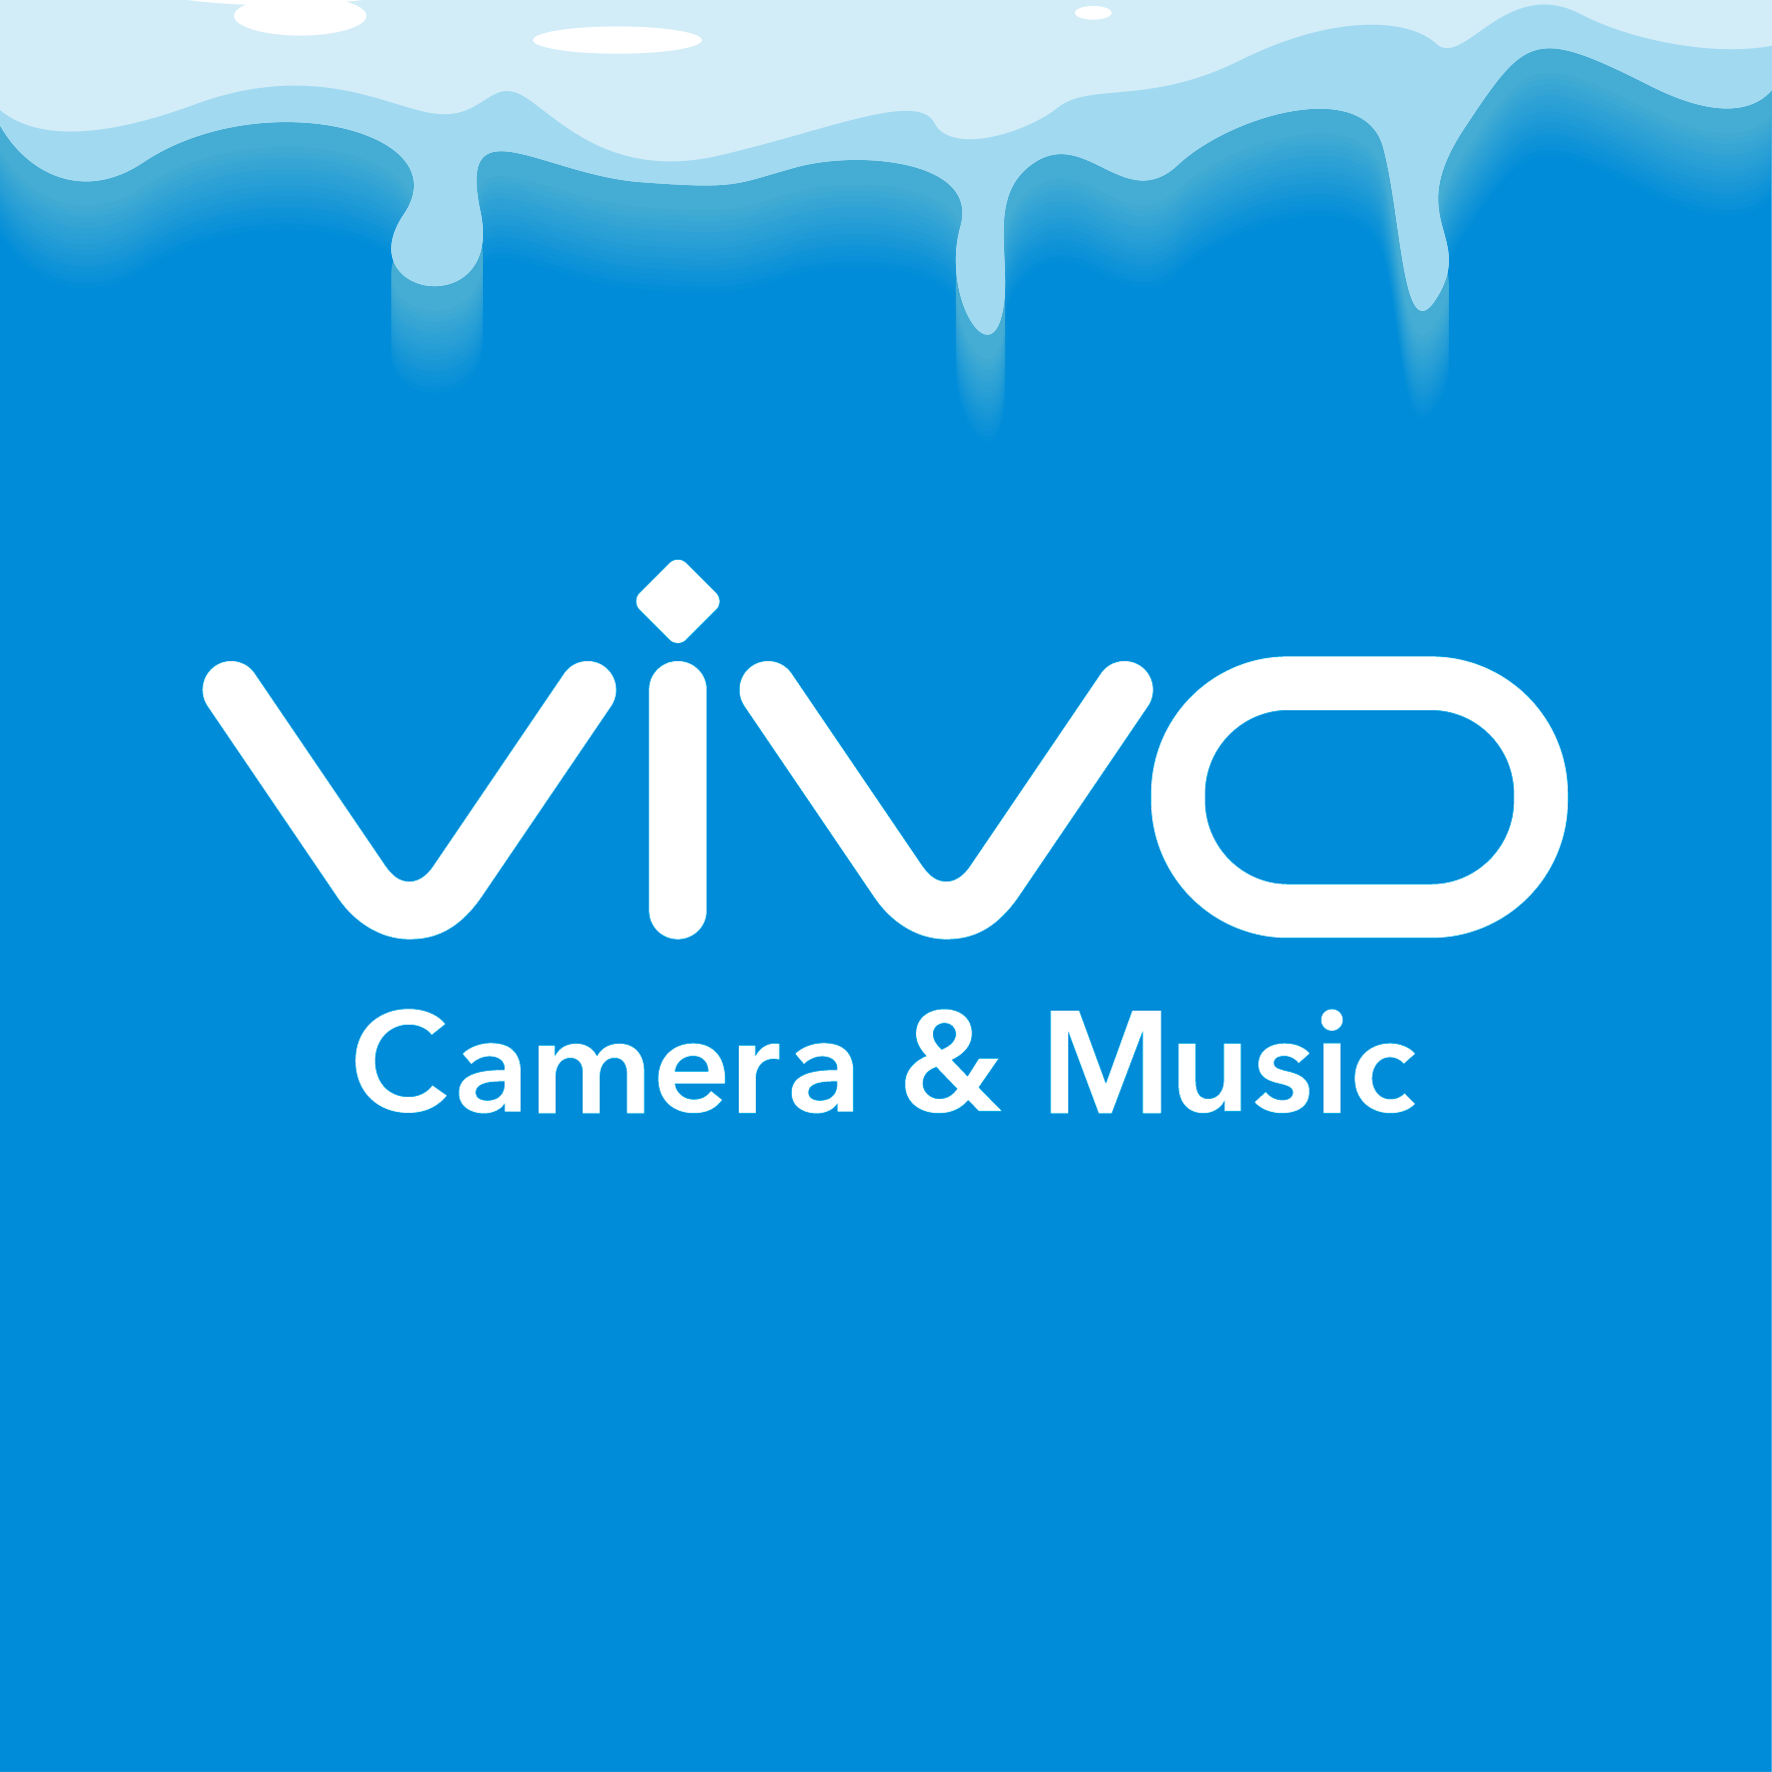 VIVO<br /> RM80 OFF, MINIMUM SPEND RM1K